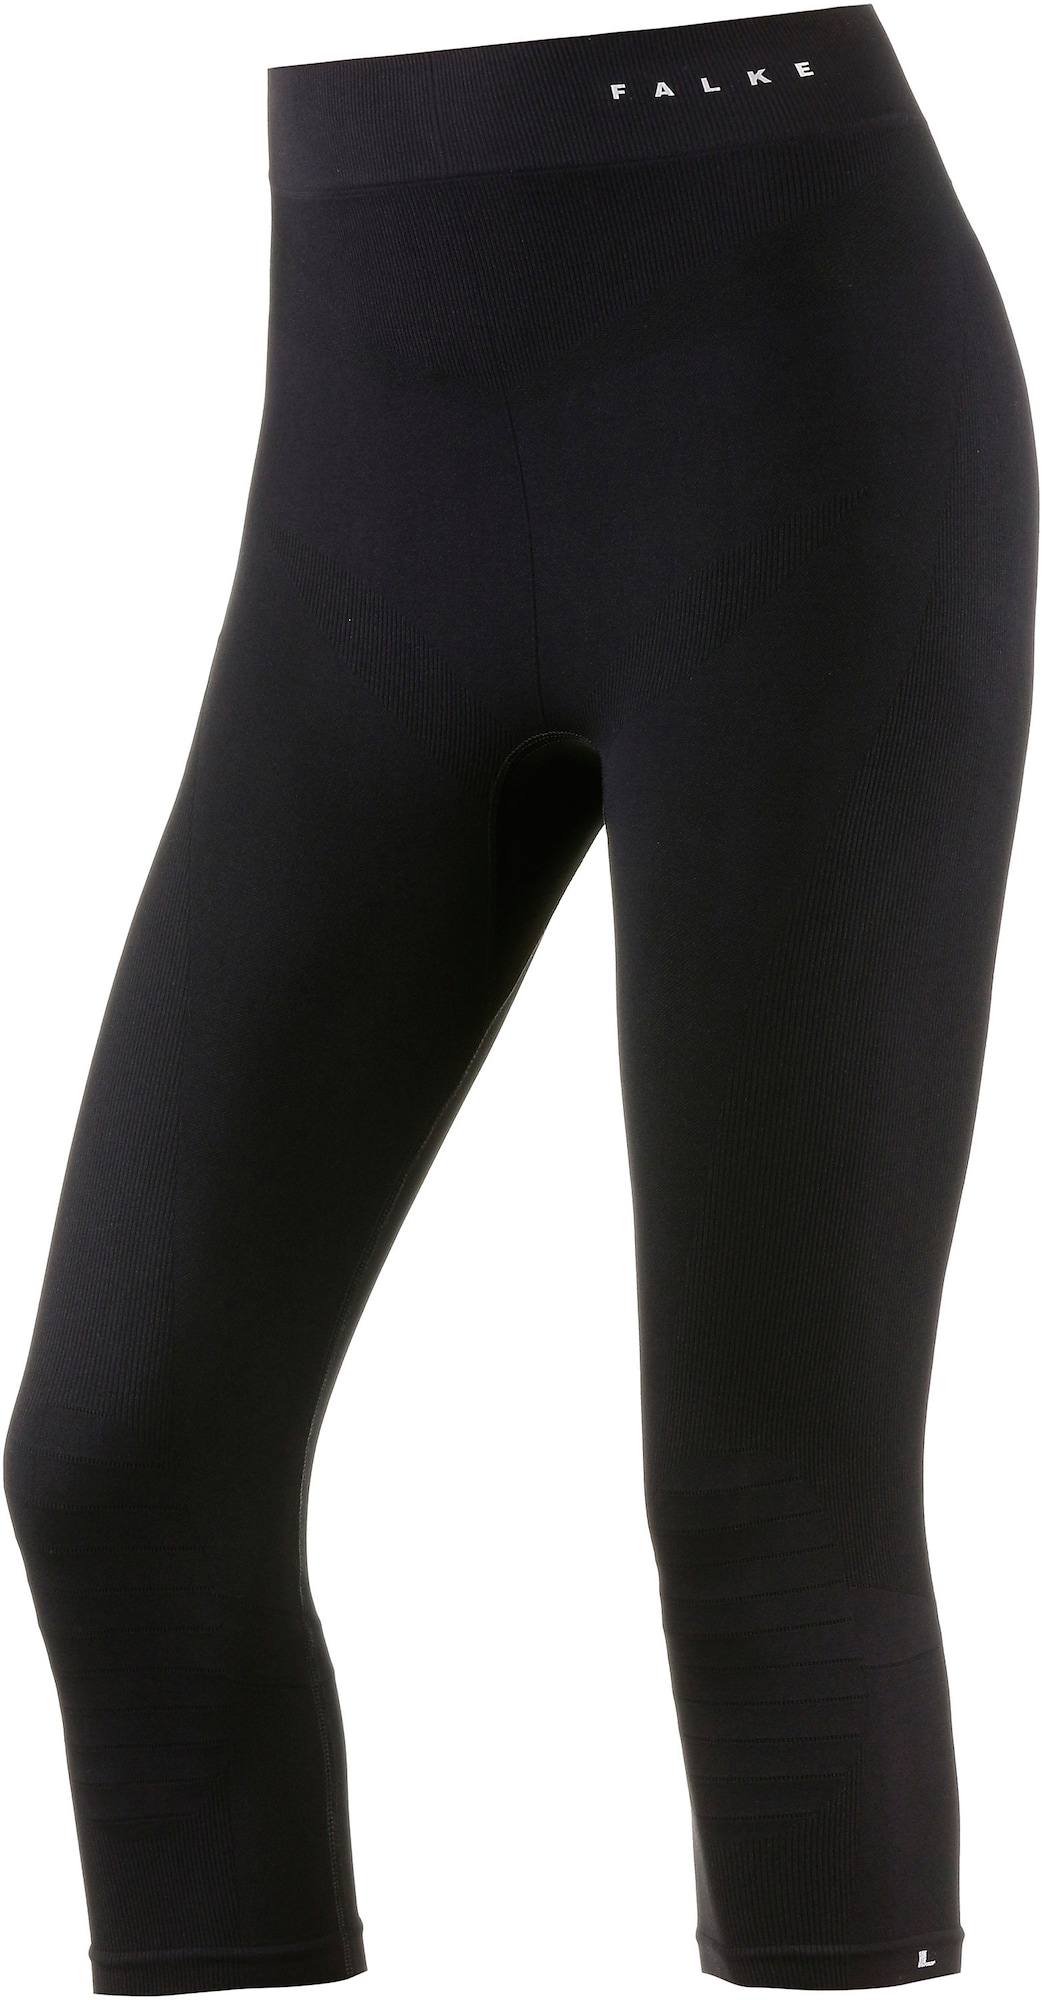 Funktionsunterhose Damen   Sportbekleidung > Funktionswäsche > Thermoleggings   Falke